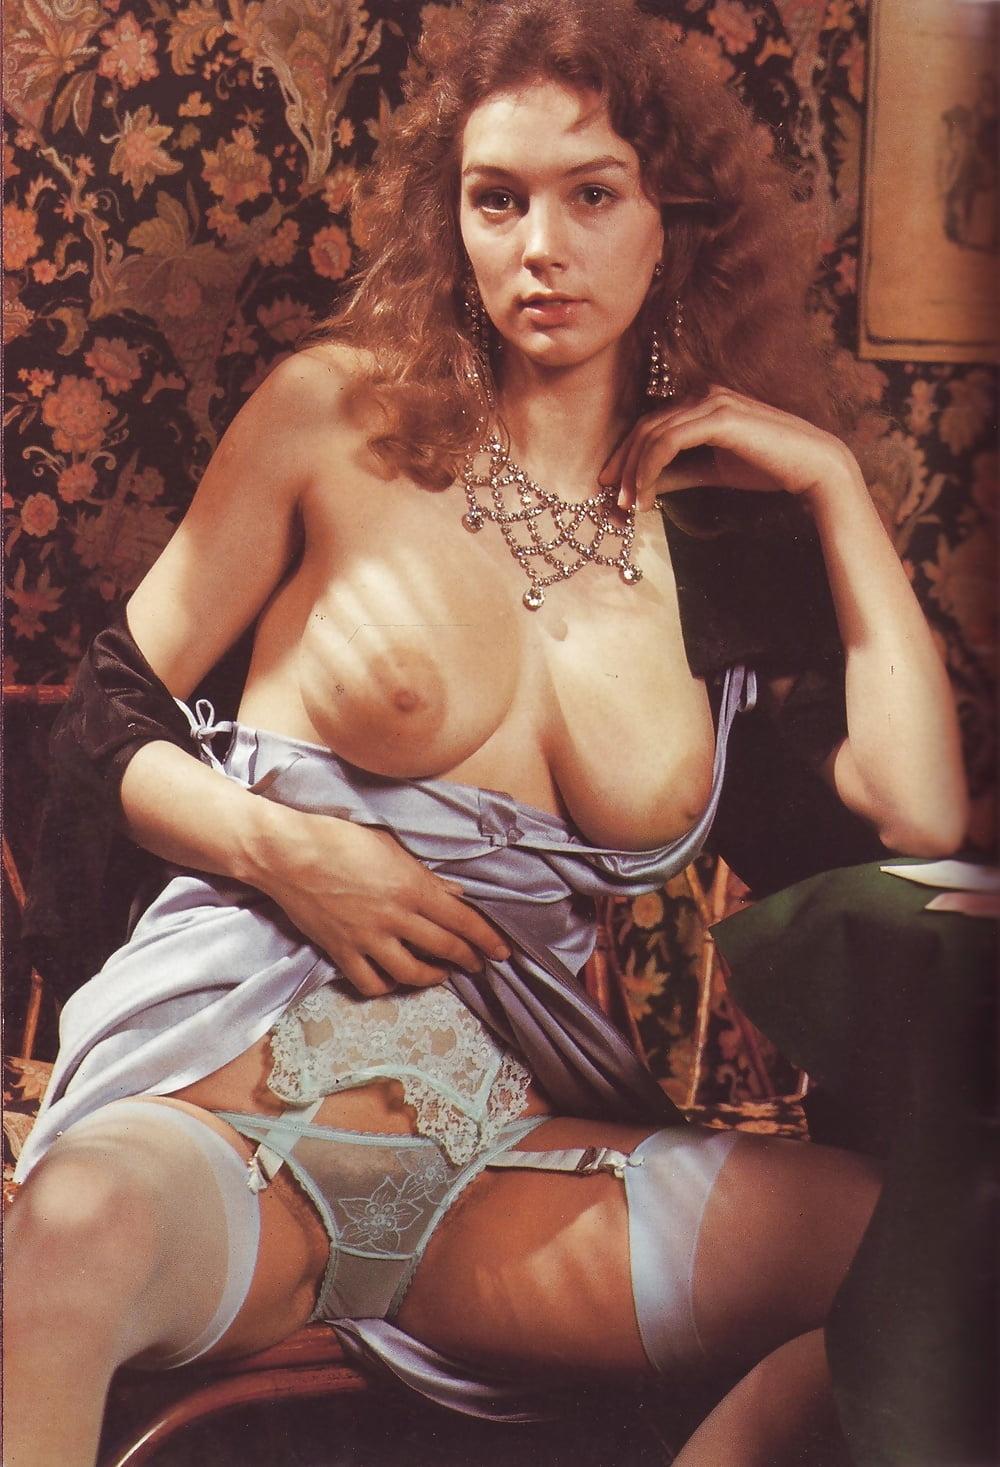 Халат с чулочками эротический фото